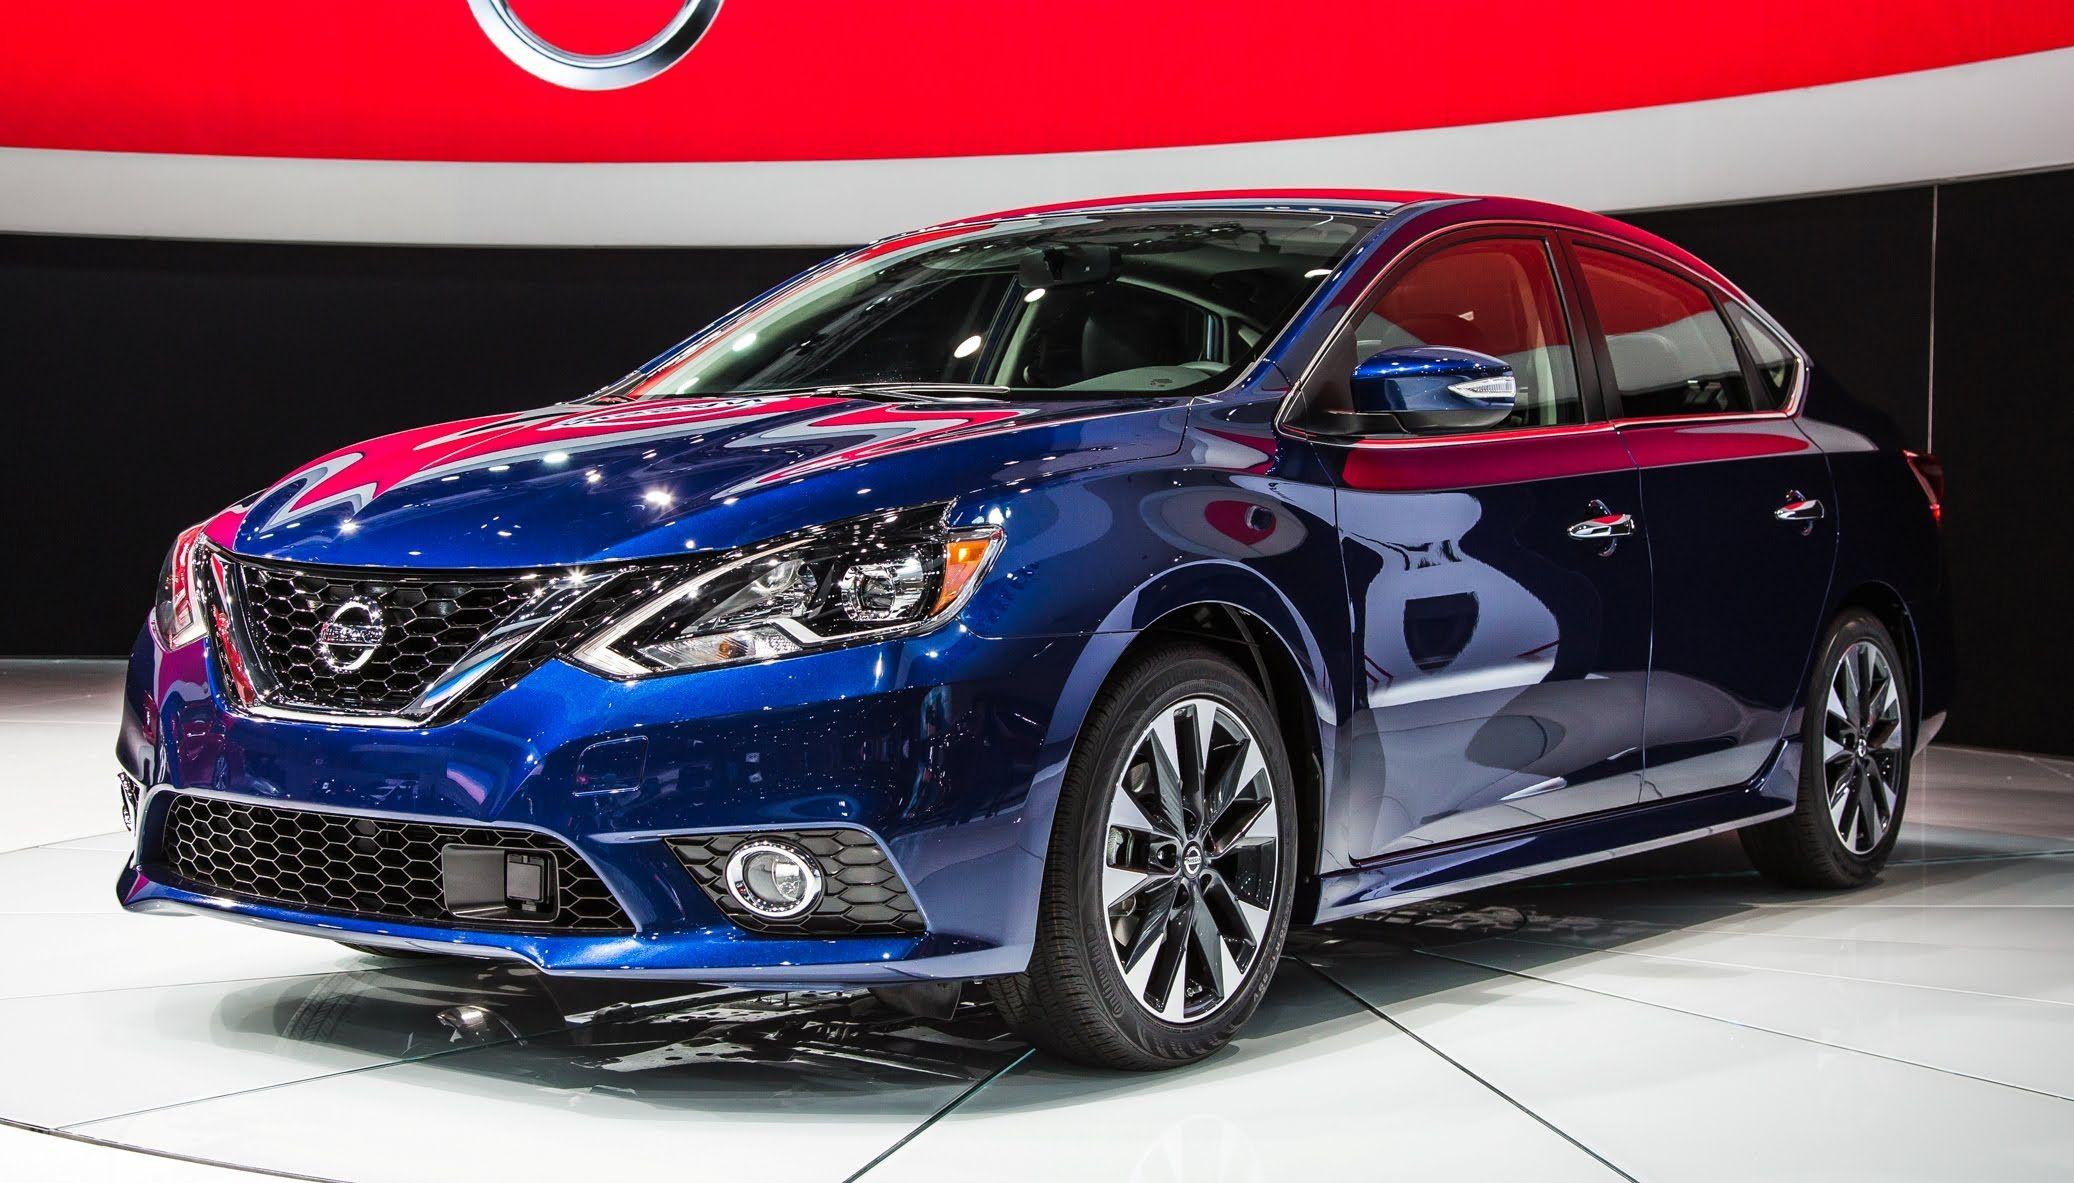 2016 Nissan Sentra La Auto Show 2015 Nissan Sentra La Auto Show Nissan